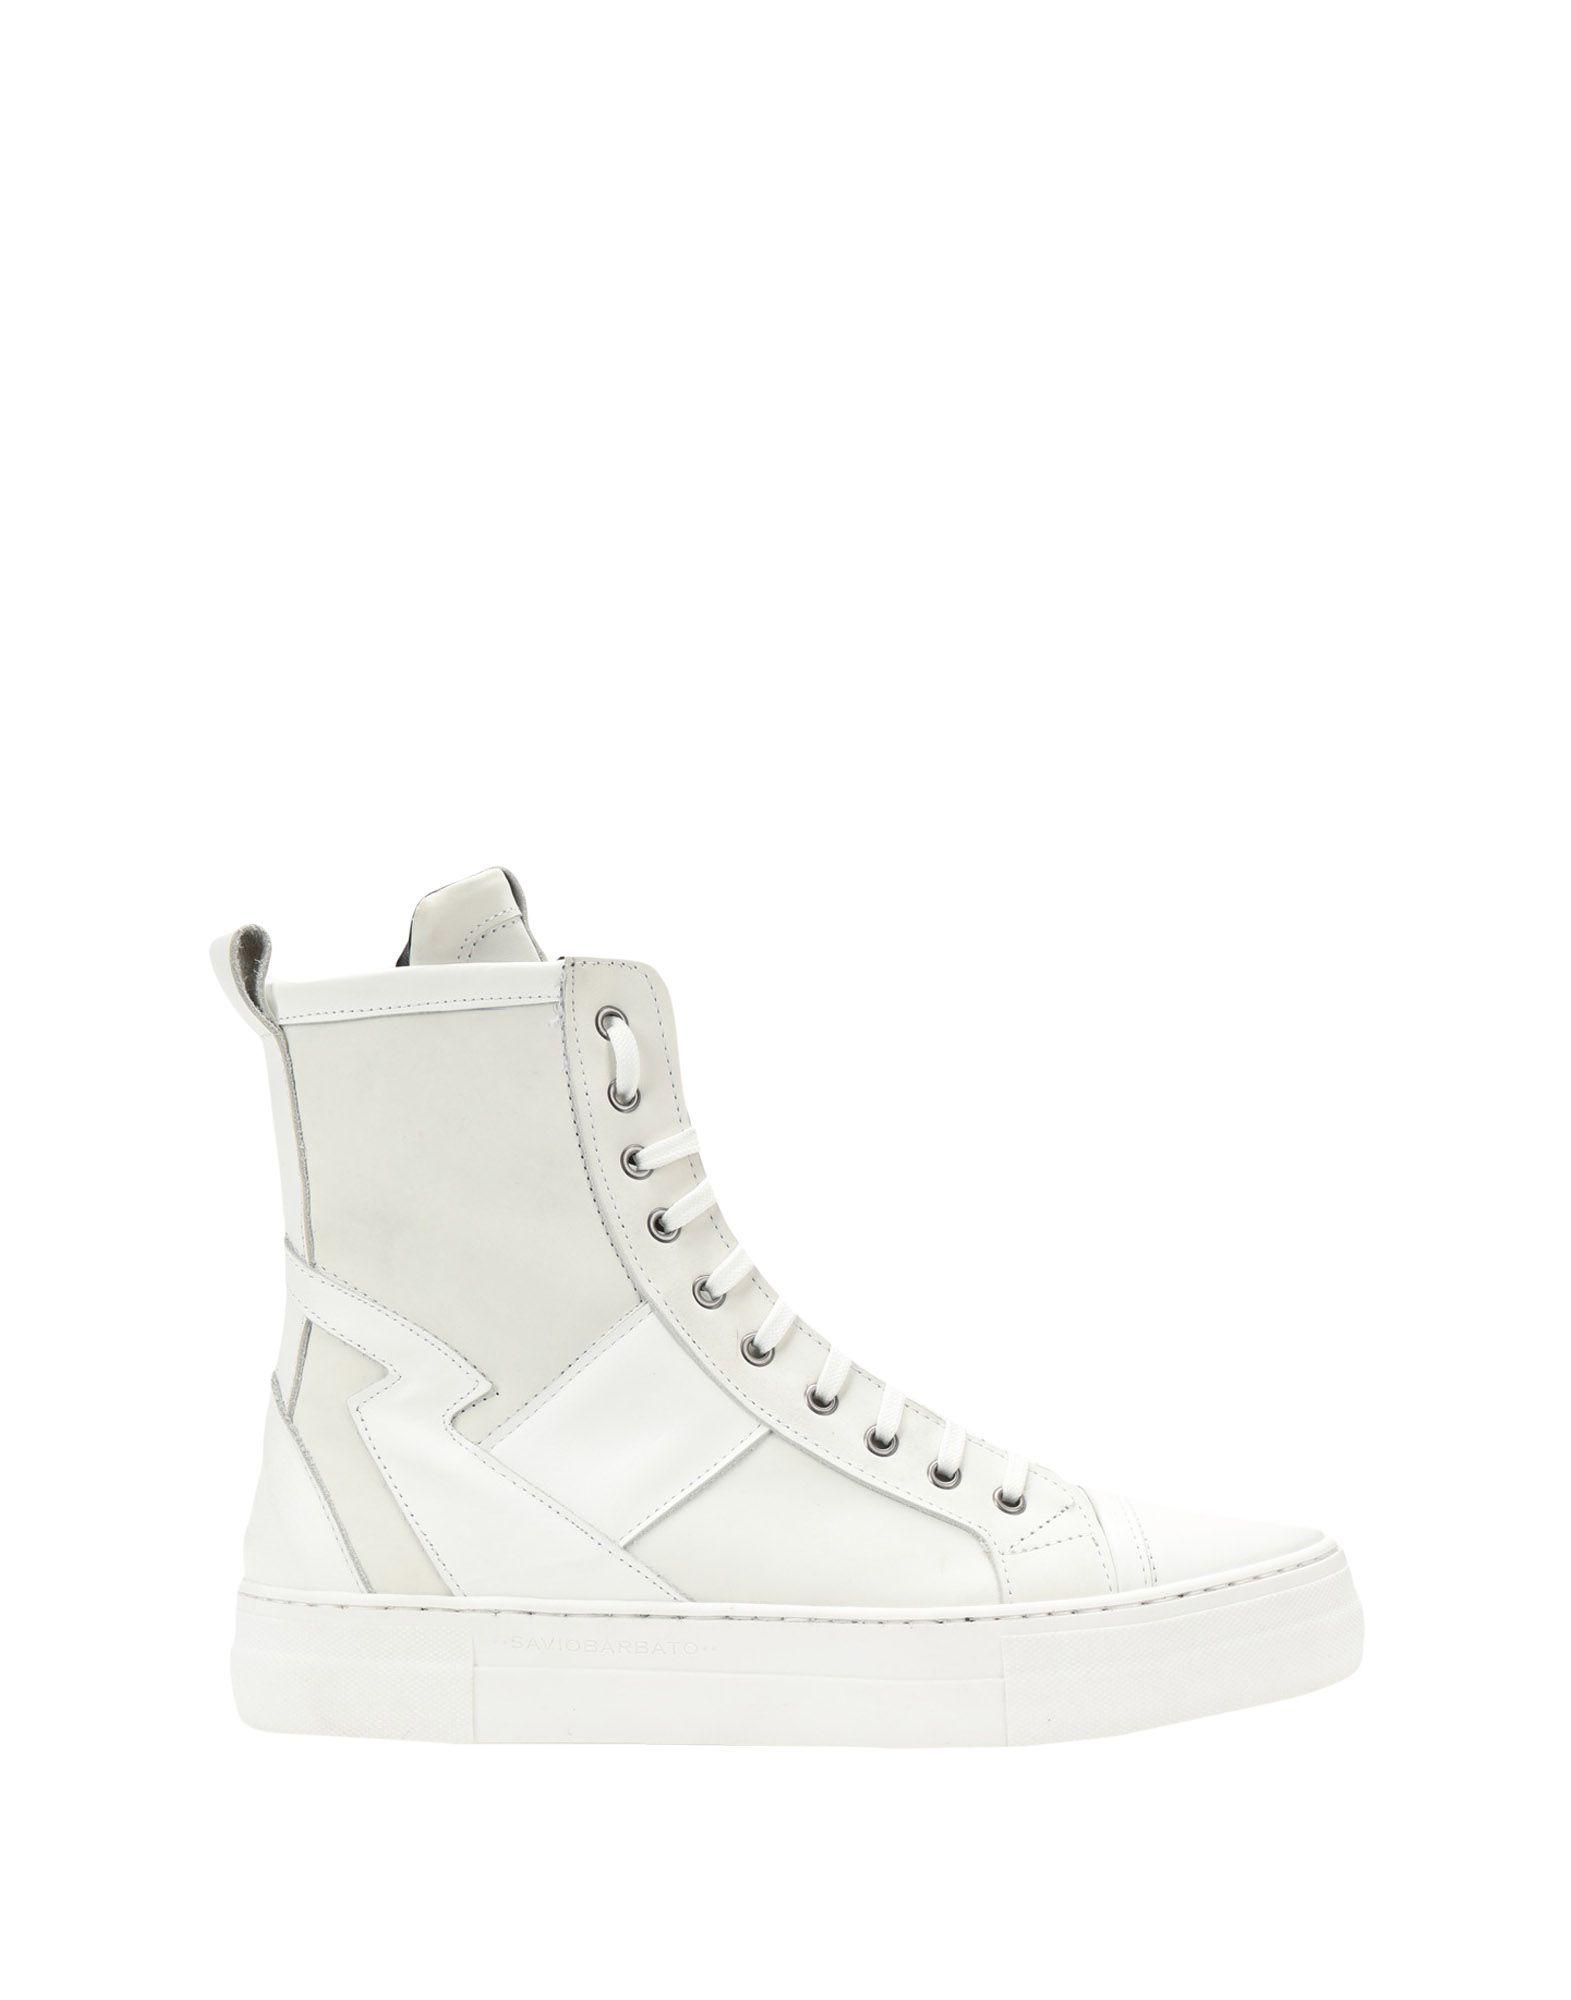 Savio Barbato Sneakers Herren  11540080OX Gute Qualität beliebte Schuhe